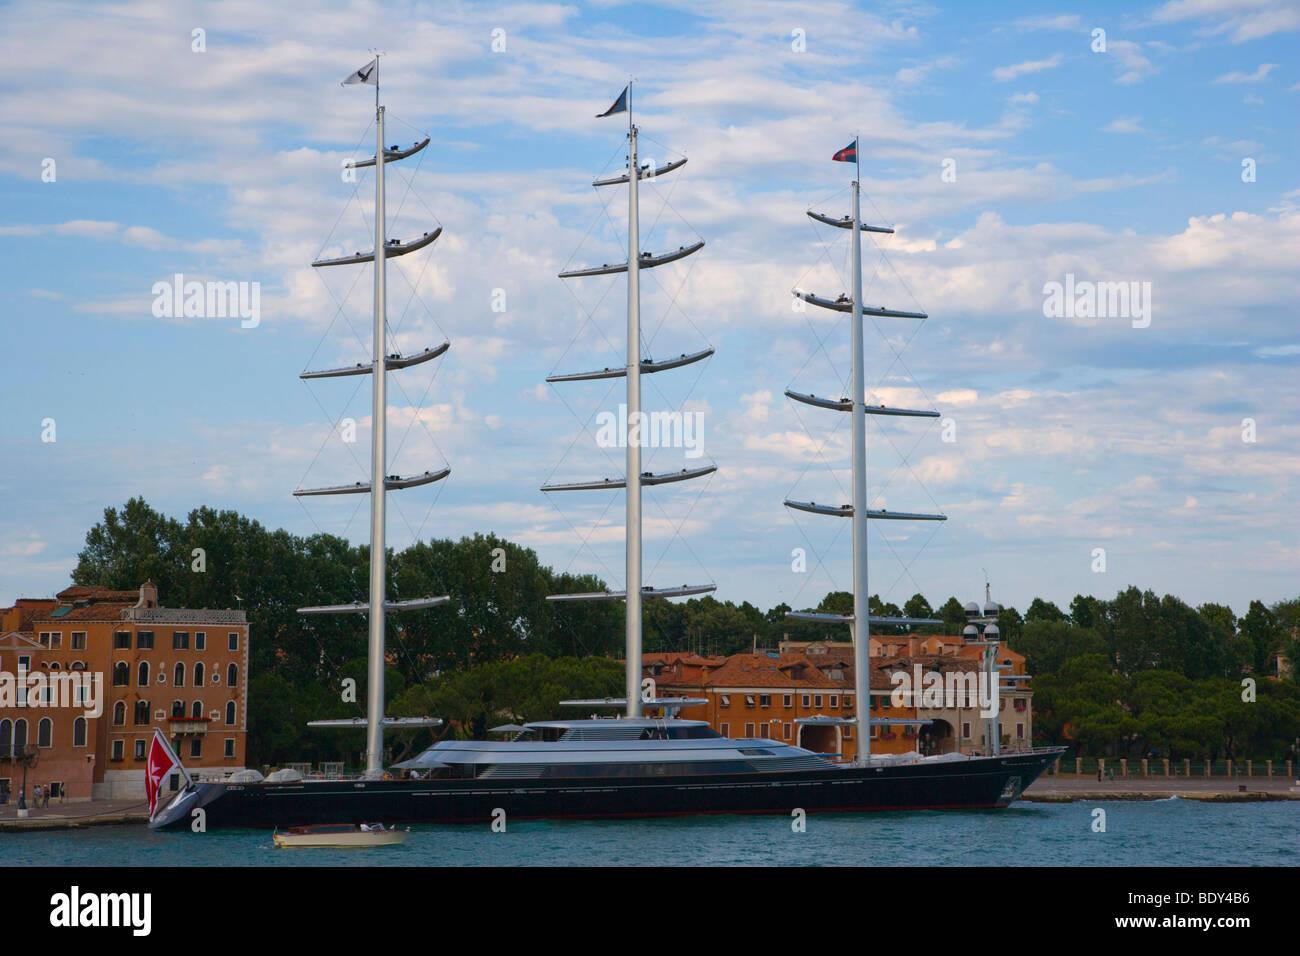 Motor yacht at Bacino di San Marco, Venice, Italy, Europe - Stock Image